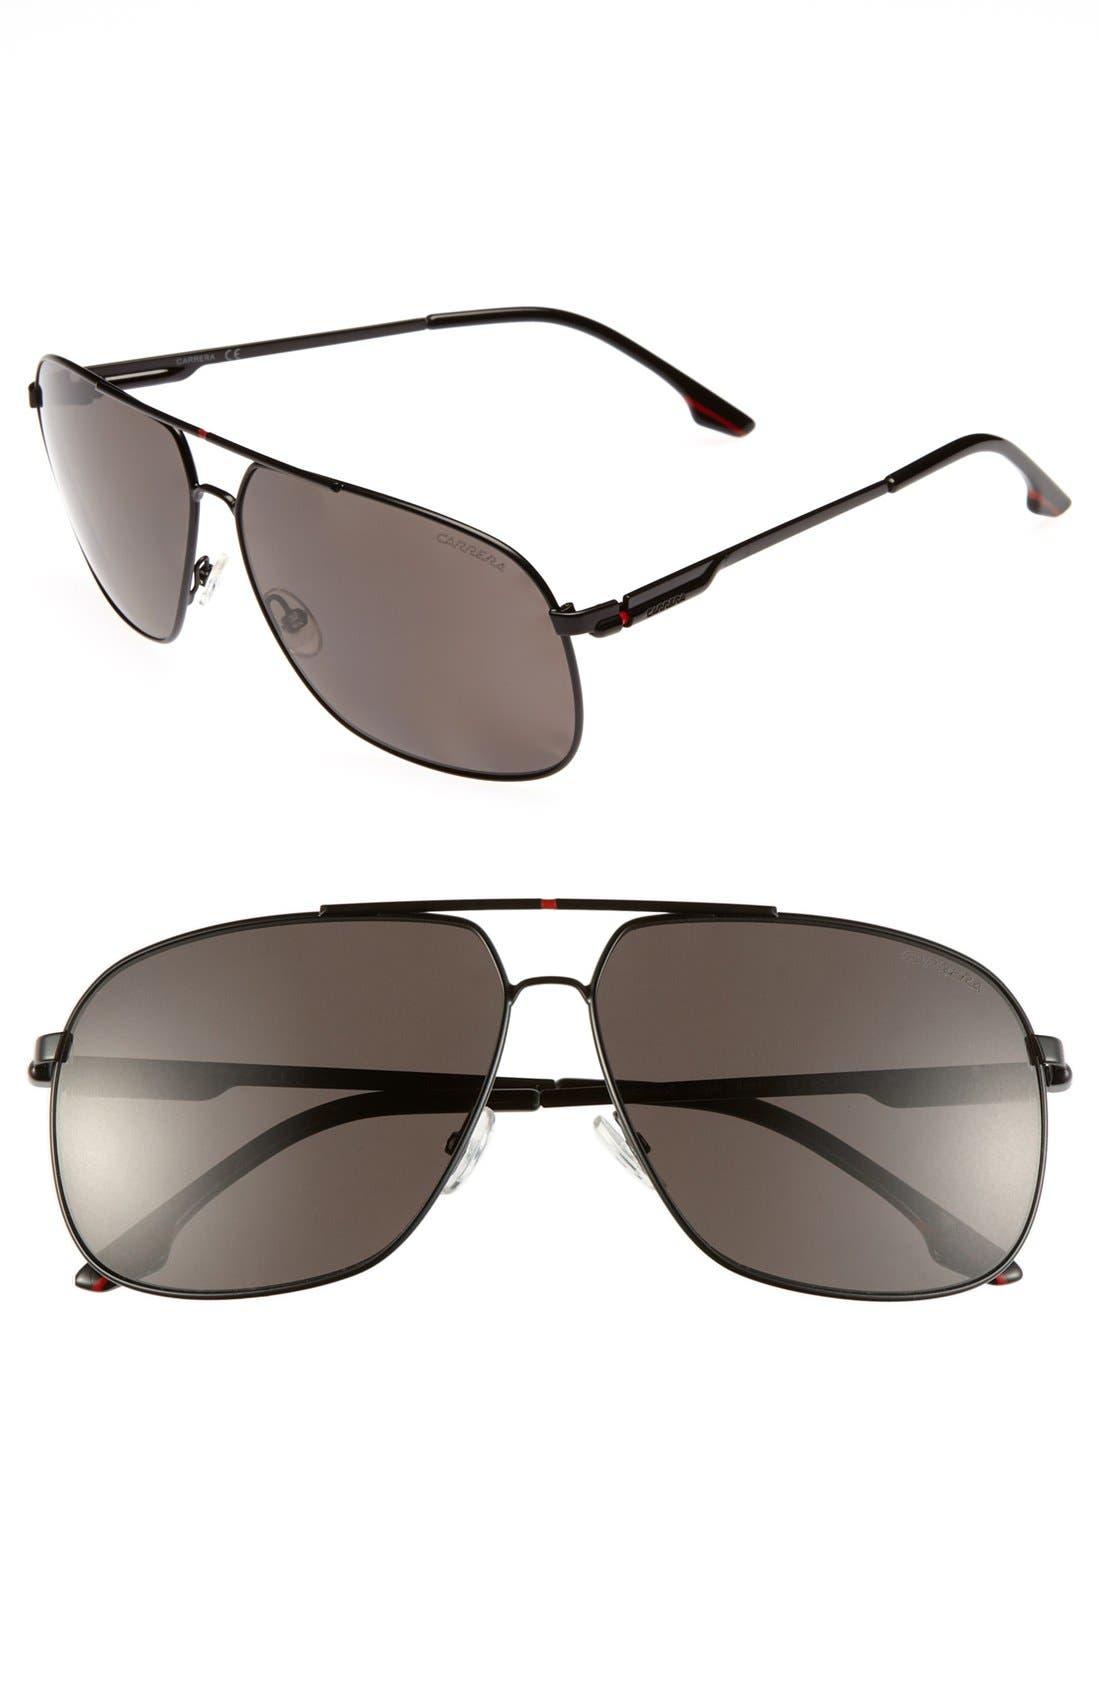 Alternate Image 1 Selected - Carrera Eyewear 59mm Sunglasses